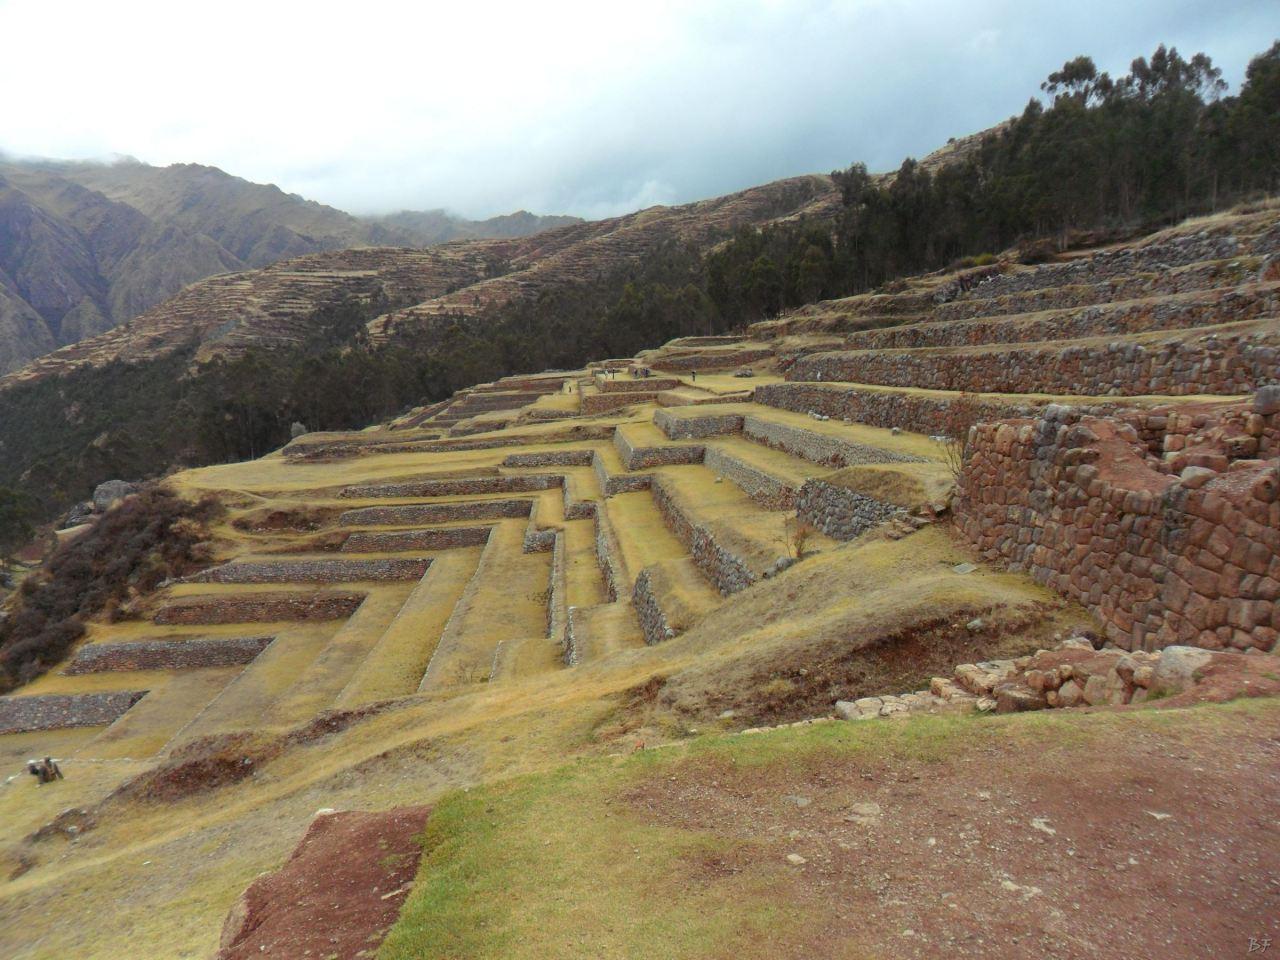 Chinchero-Mura-Poligonali-Piramide-Urubamba-Peru-41